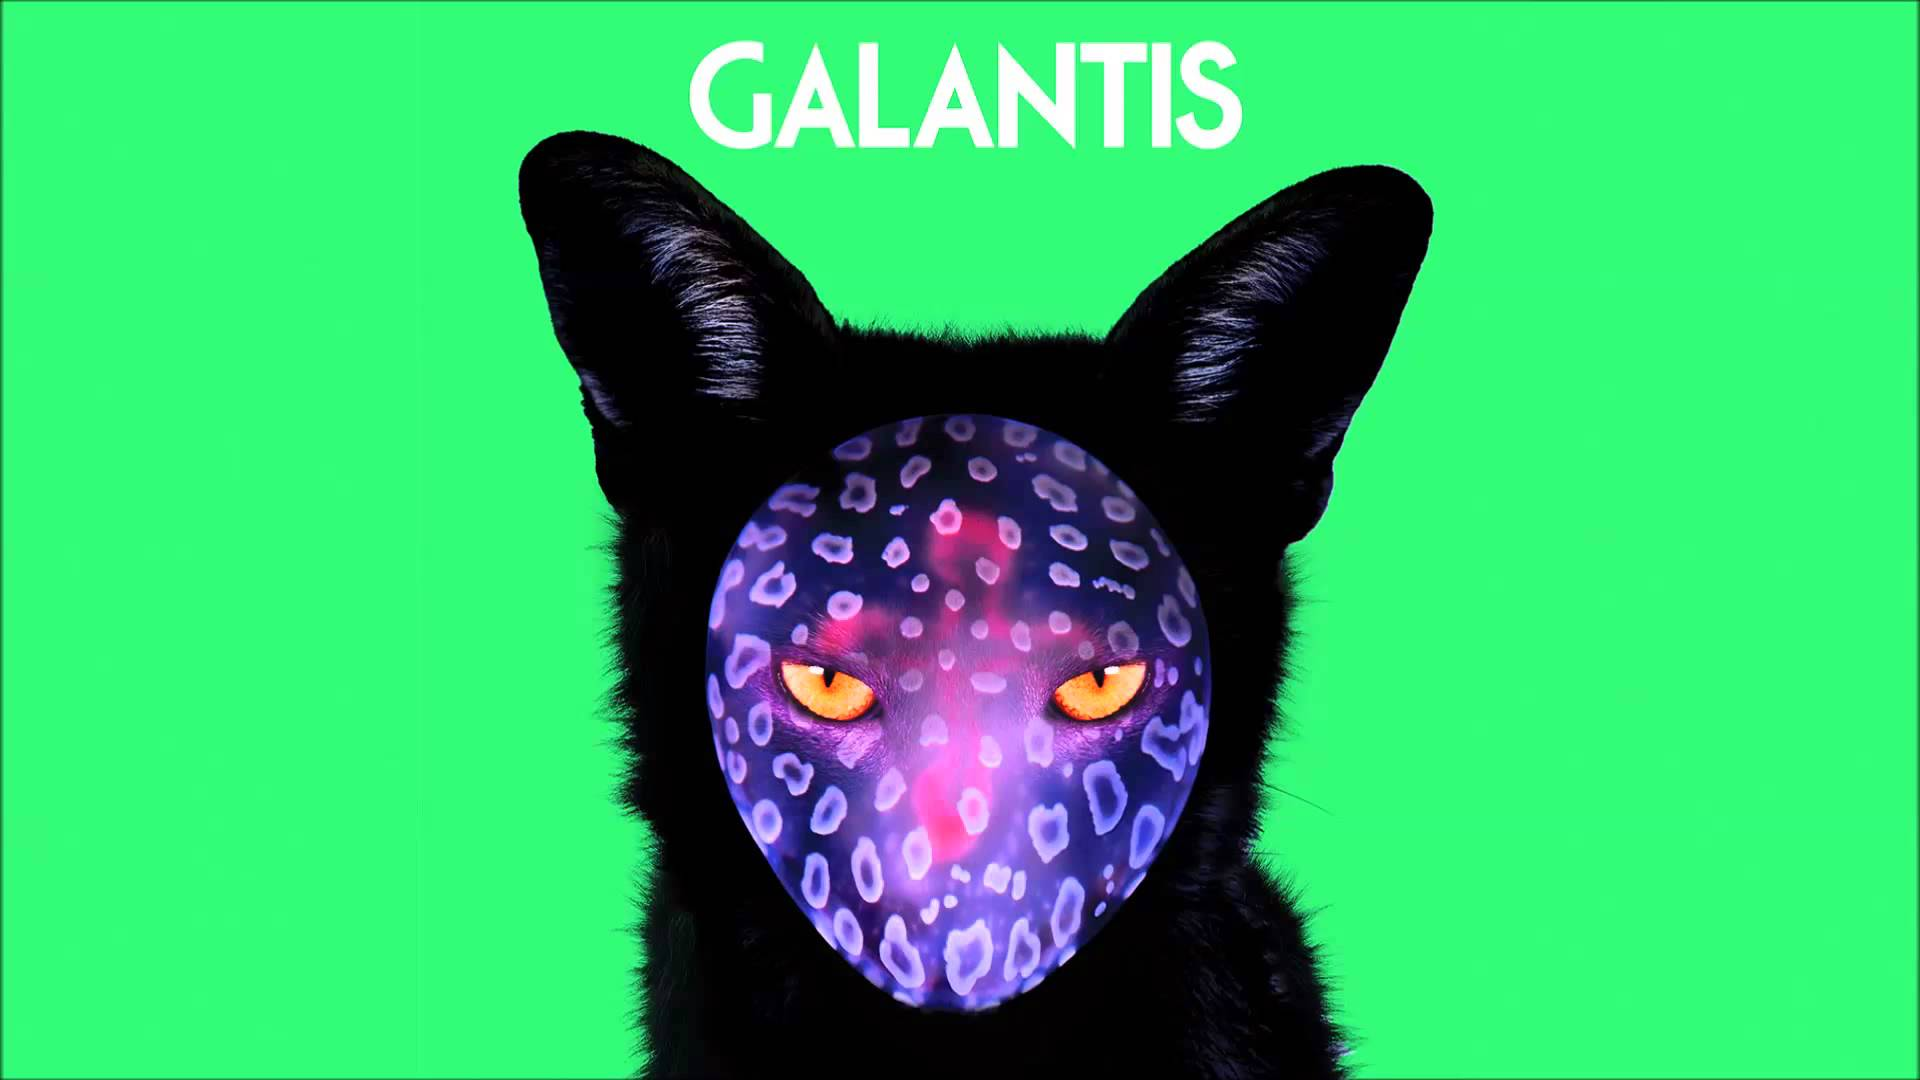 galantis background hd wallpaper 2248